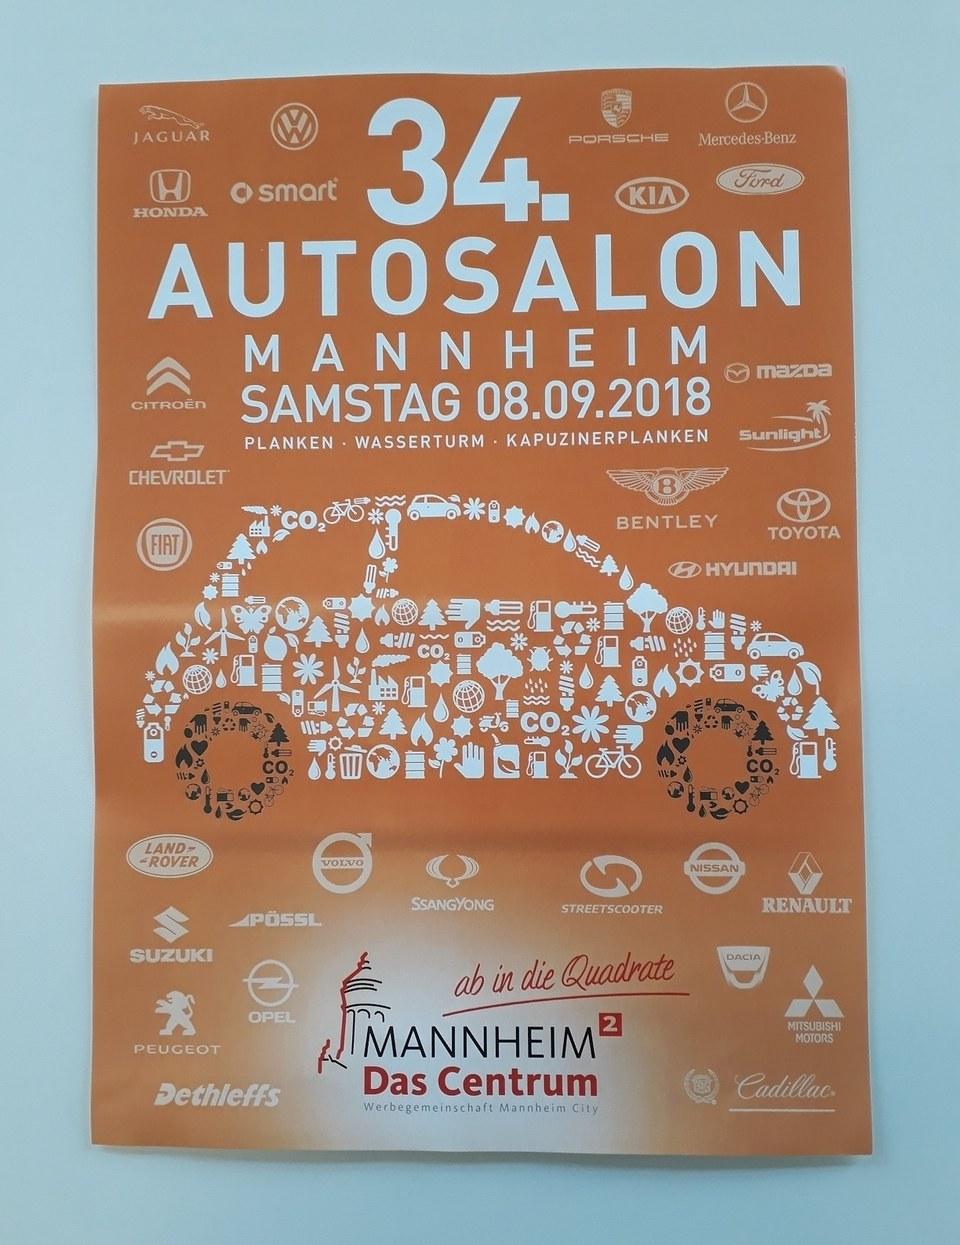 Autosalon Mannheim